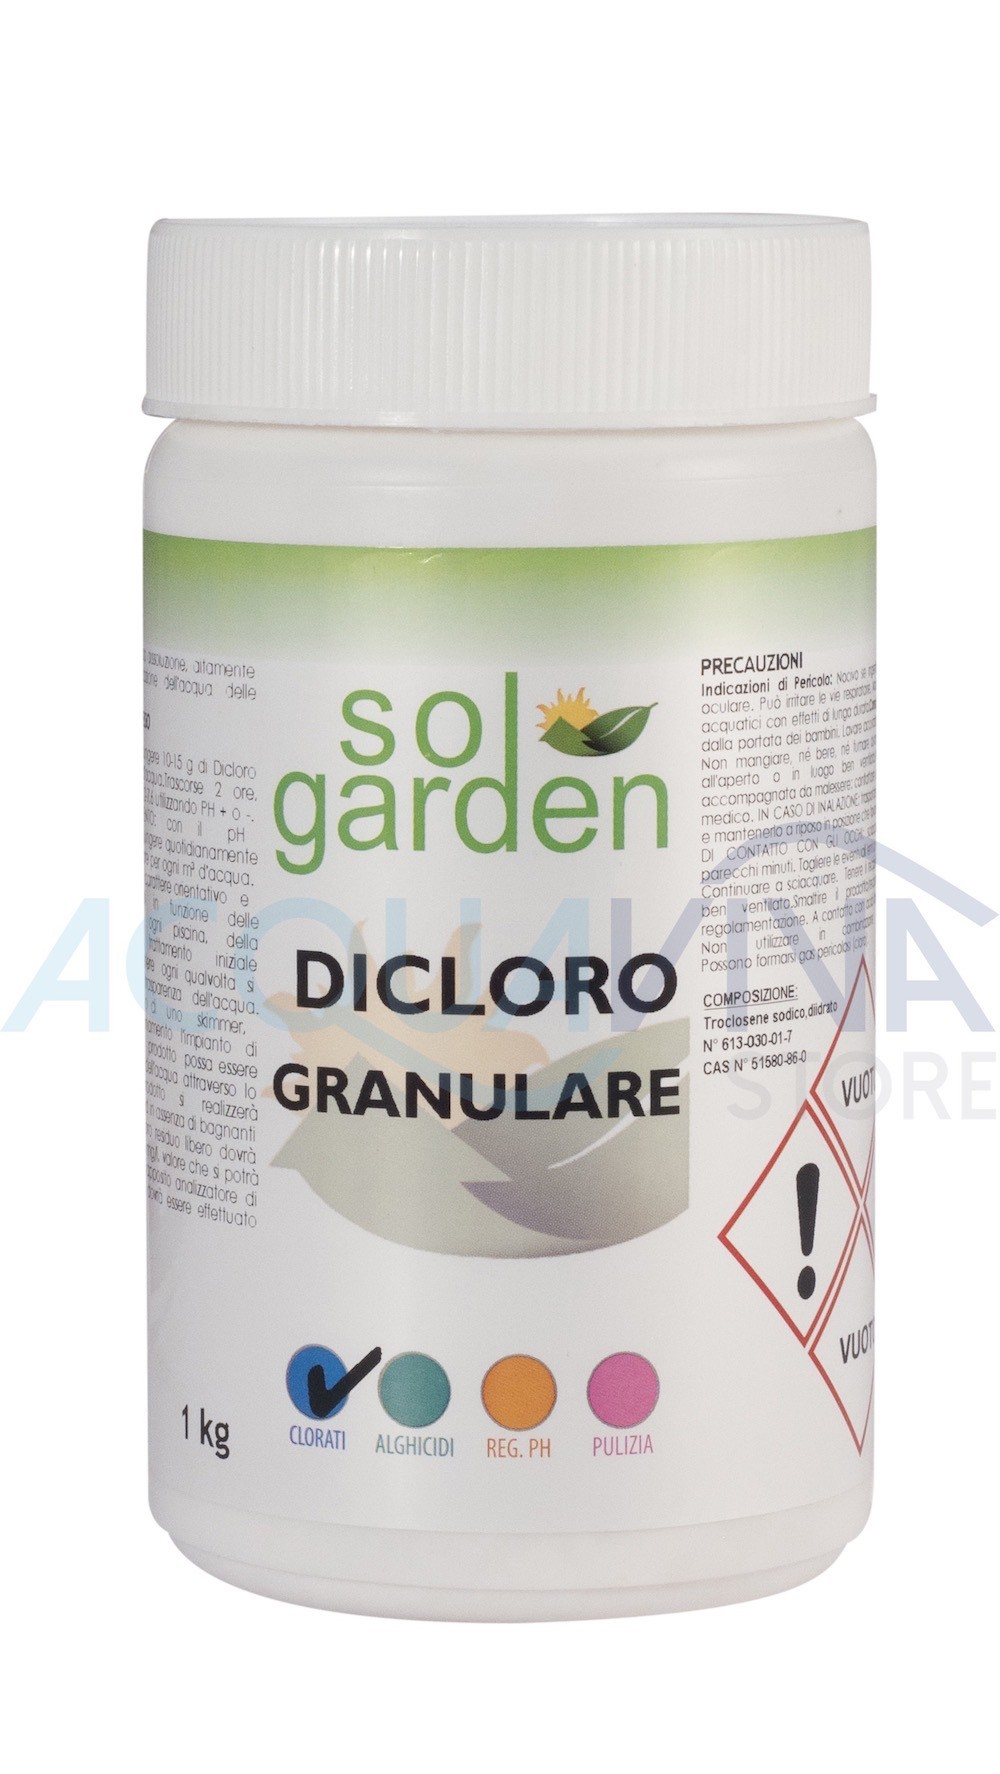 Dicloro - cloro Granulare 1Kg SolGarden